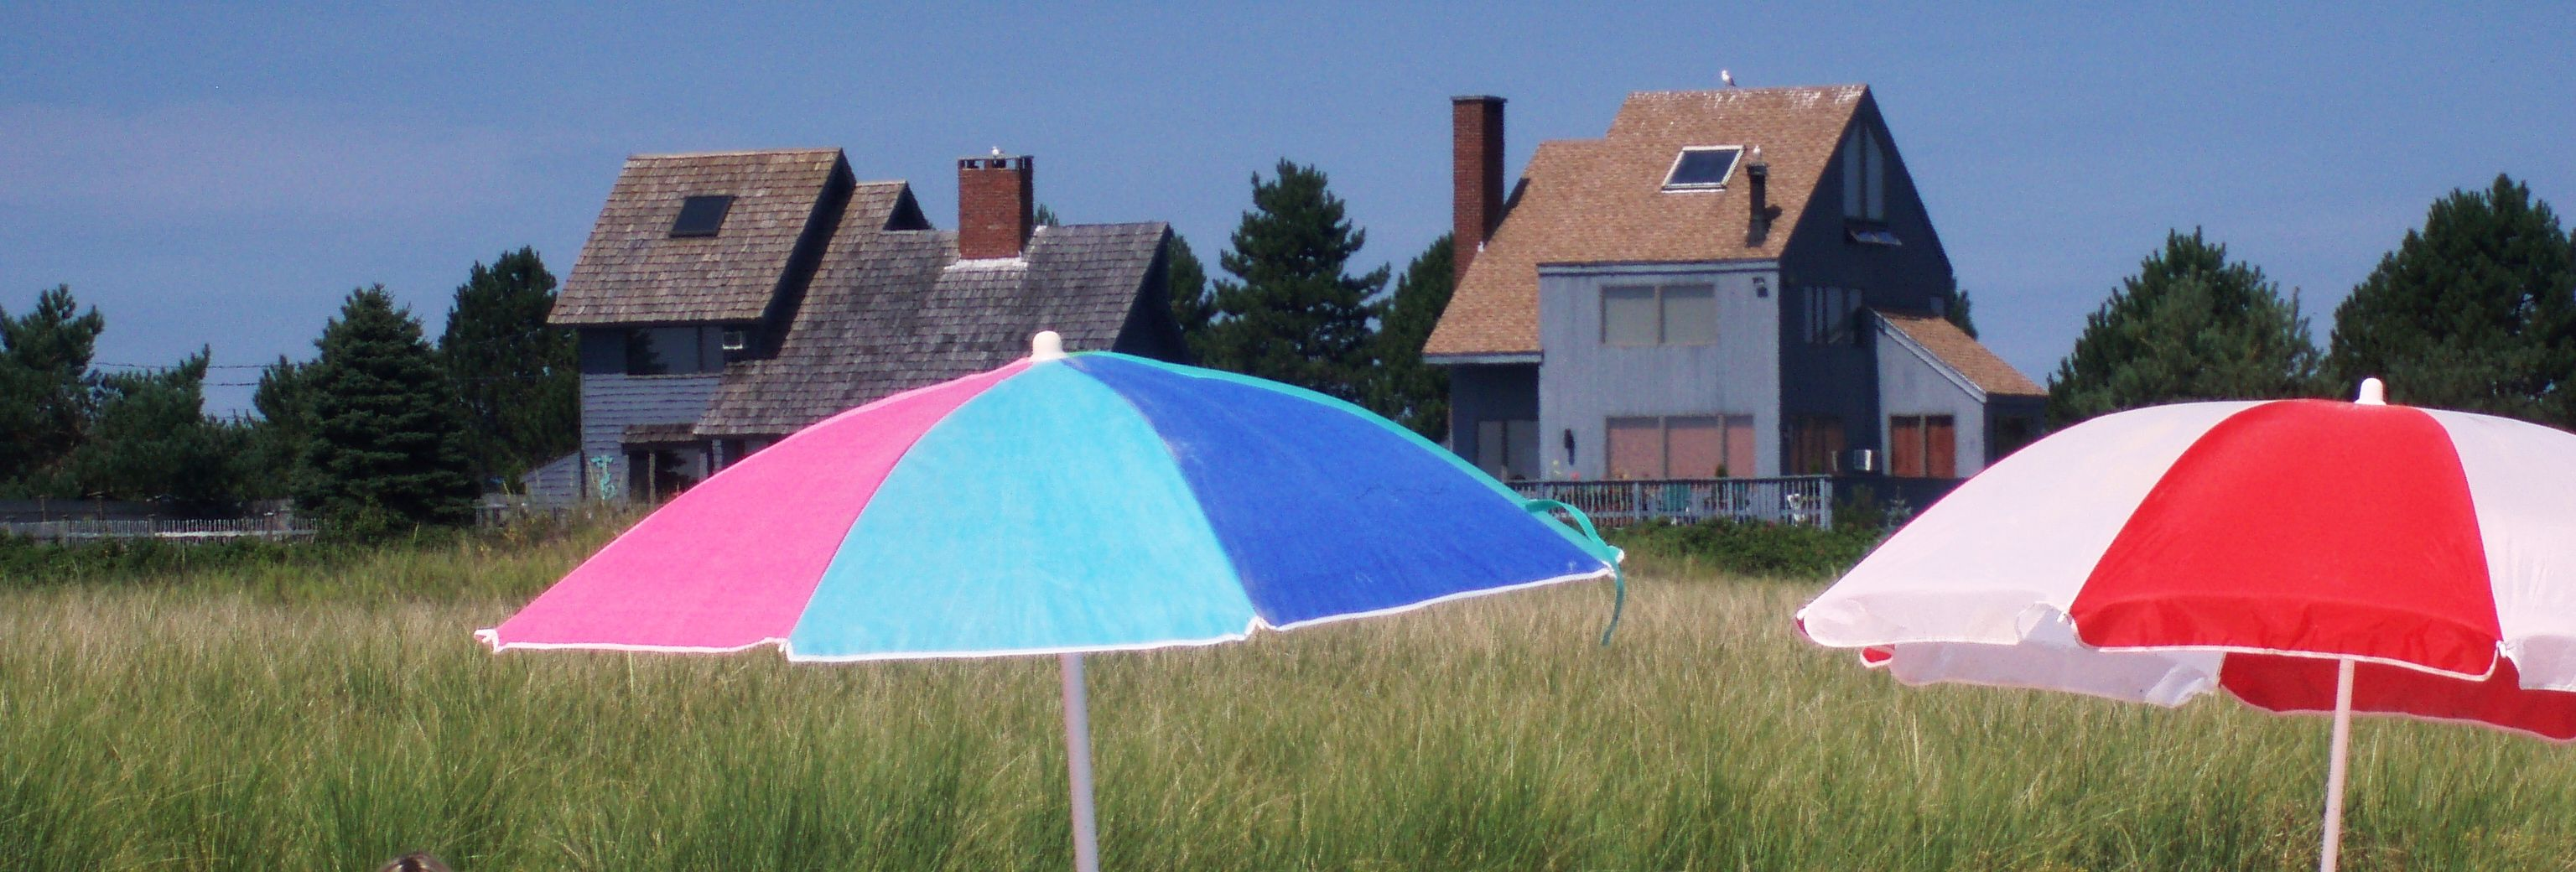 Umbrellas at Wells Beach